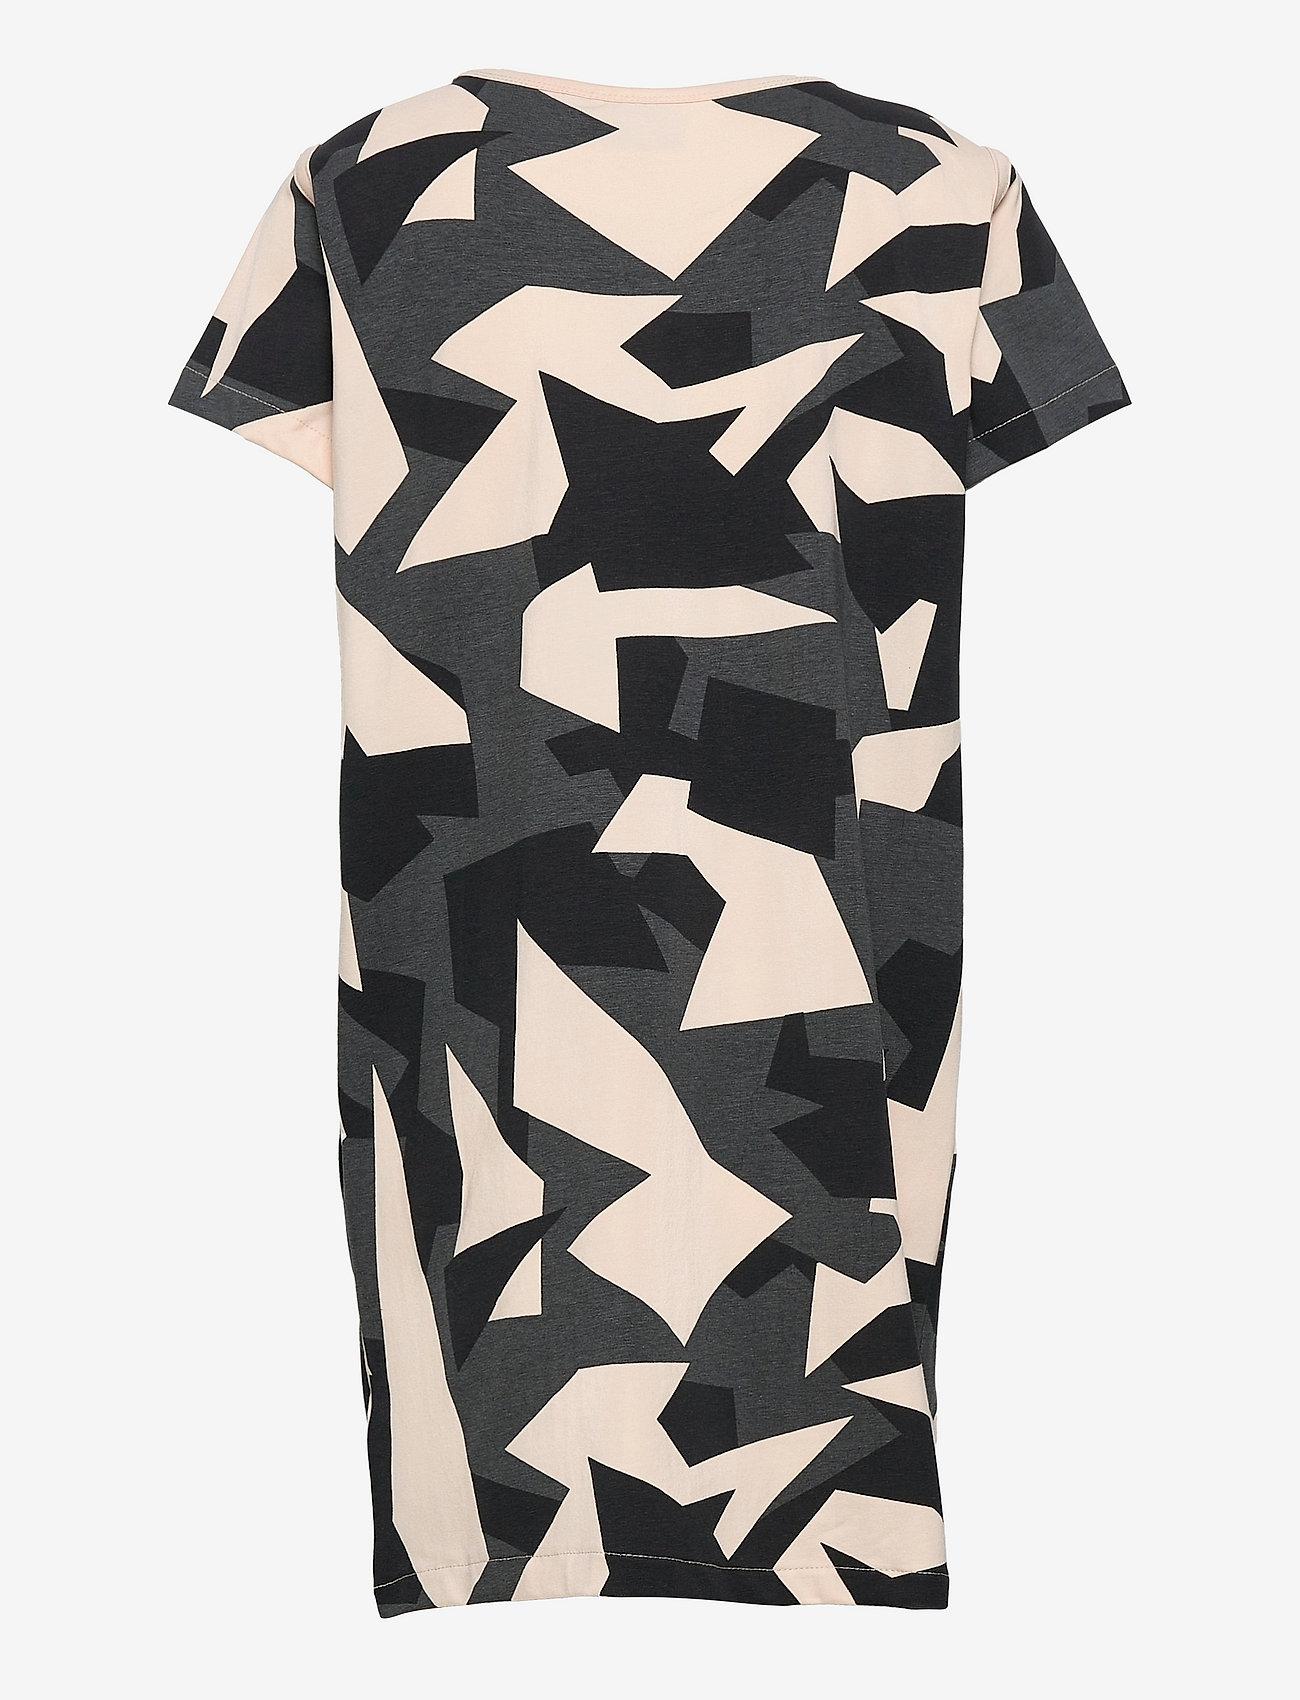 Hummel - hmlDISH DRESS S/S - kleider - black/black - 1